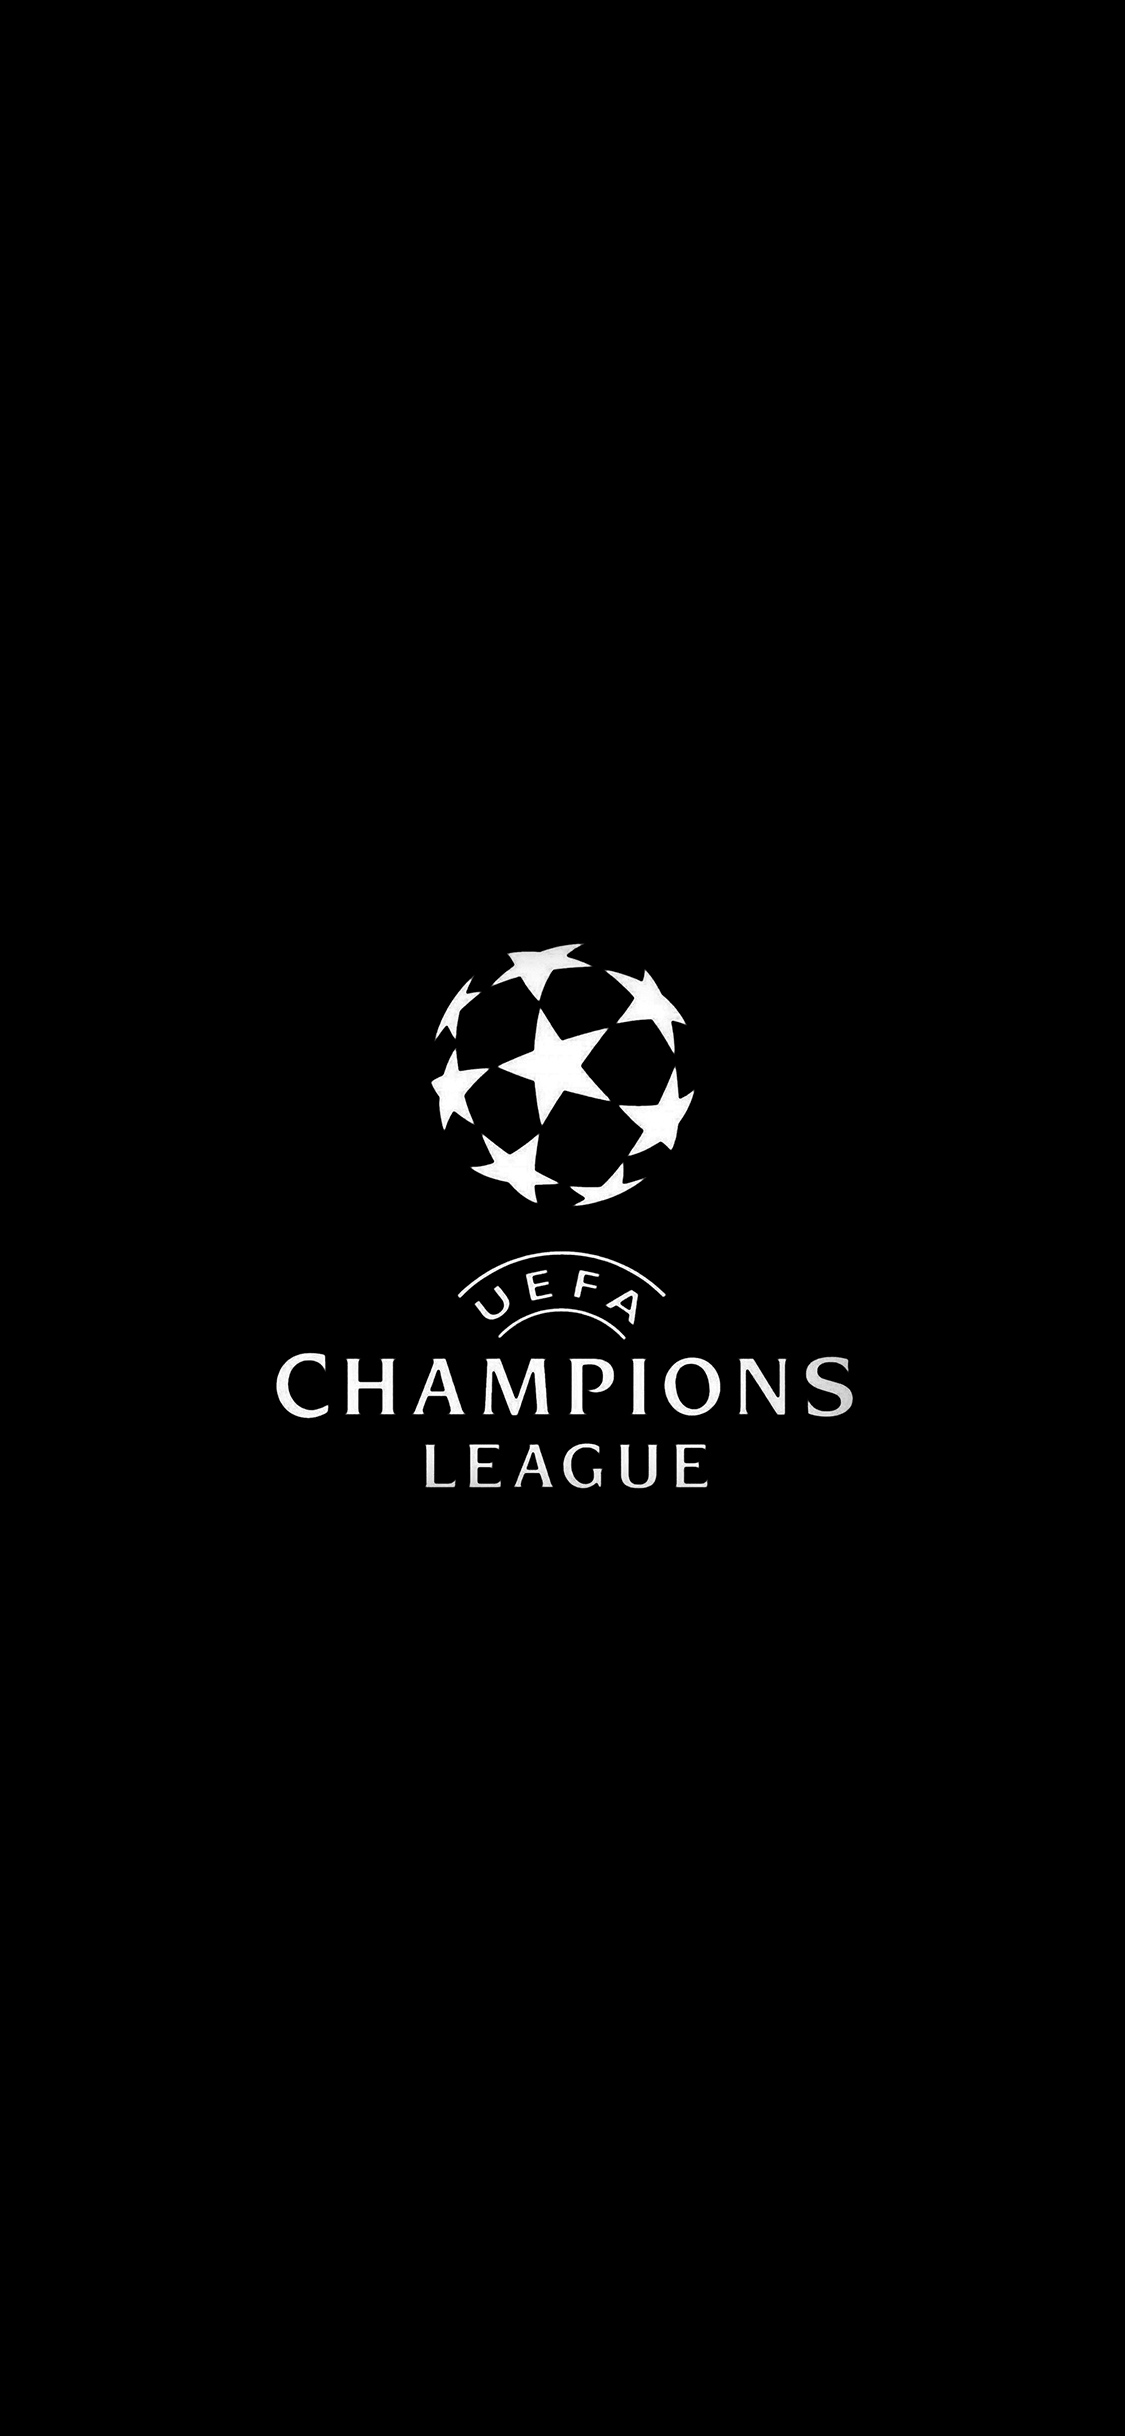 iPhoneXpapers.com-Apple-iPhone-wallpaper-at89-champions-league-europe-logo-soccer-art-illustration-dark-bw